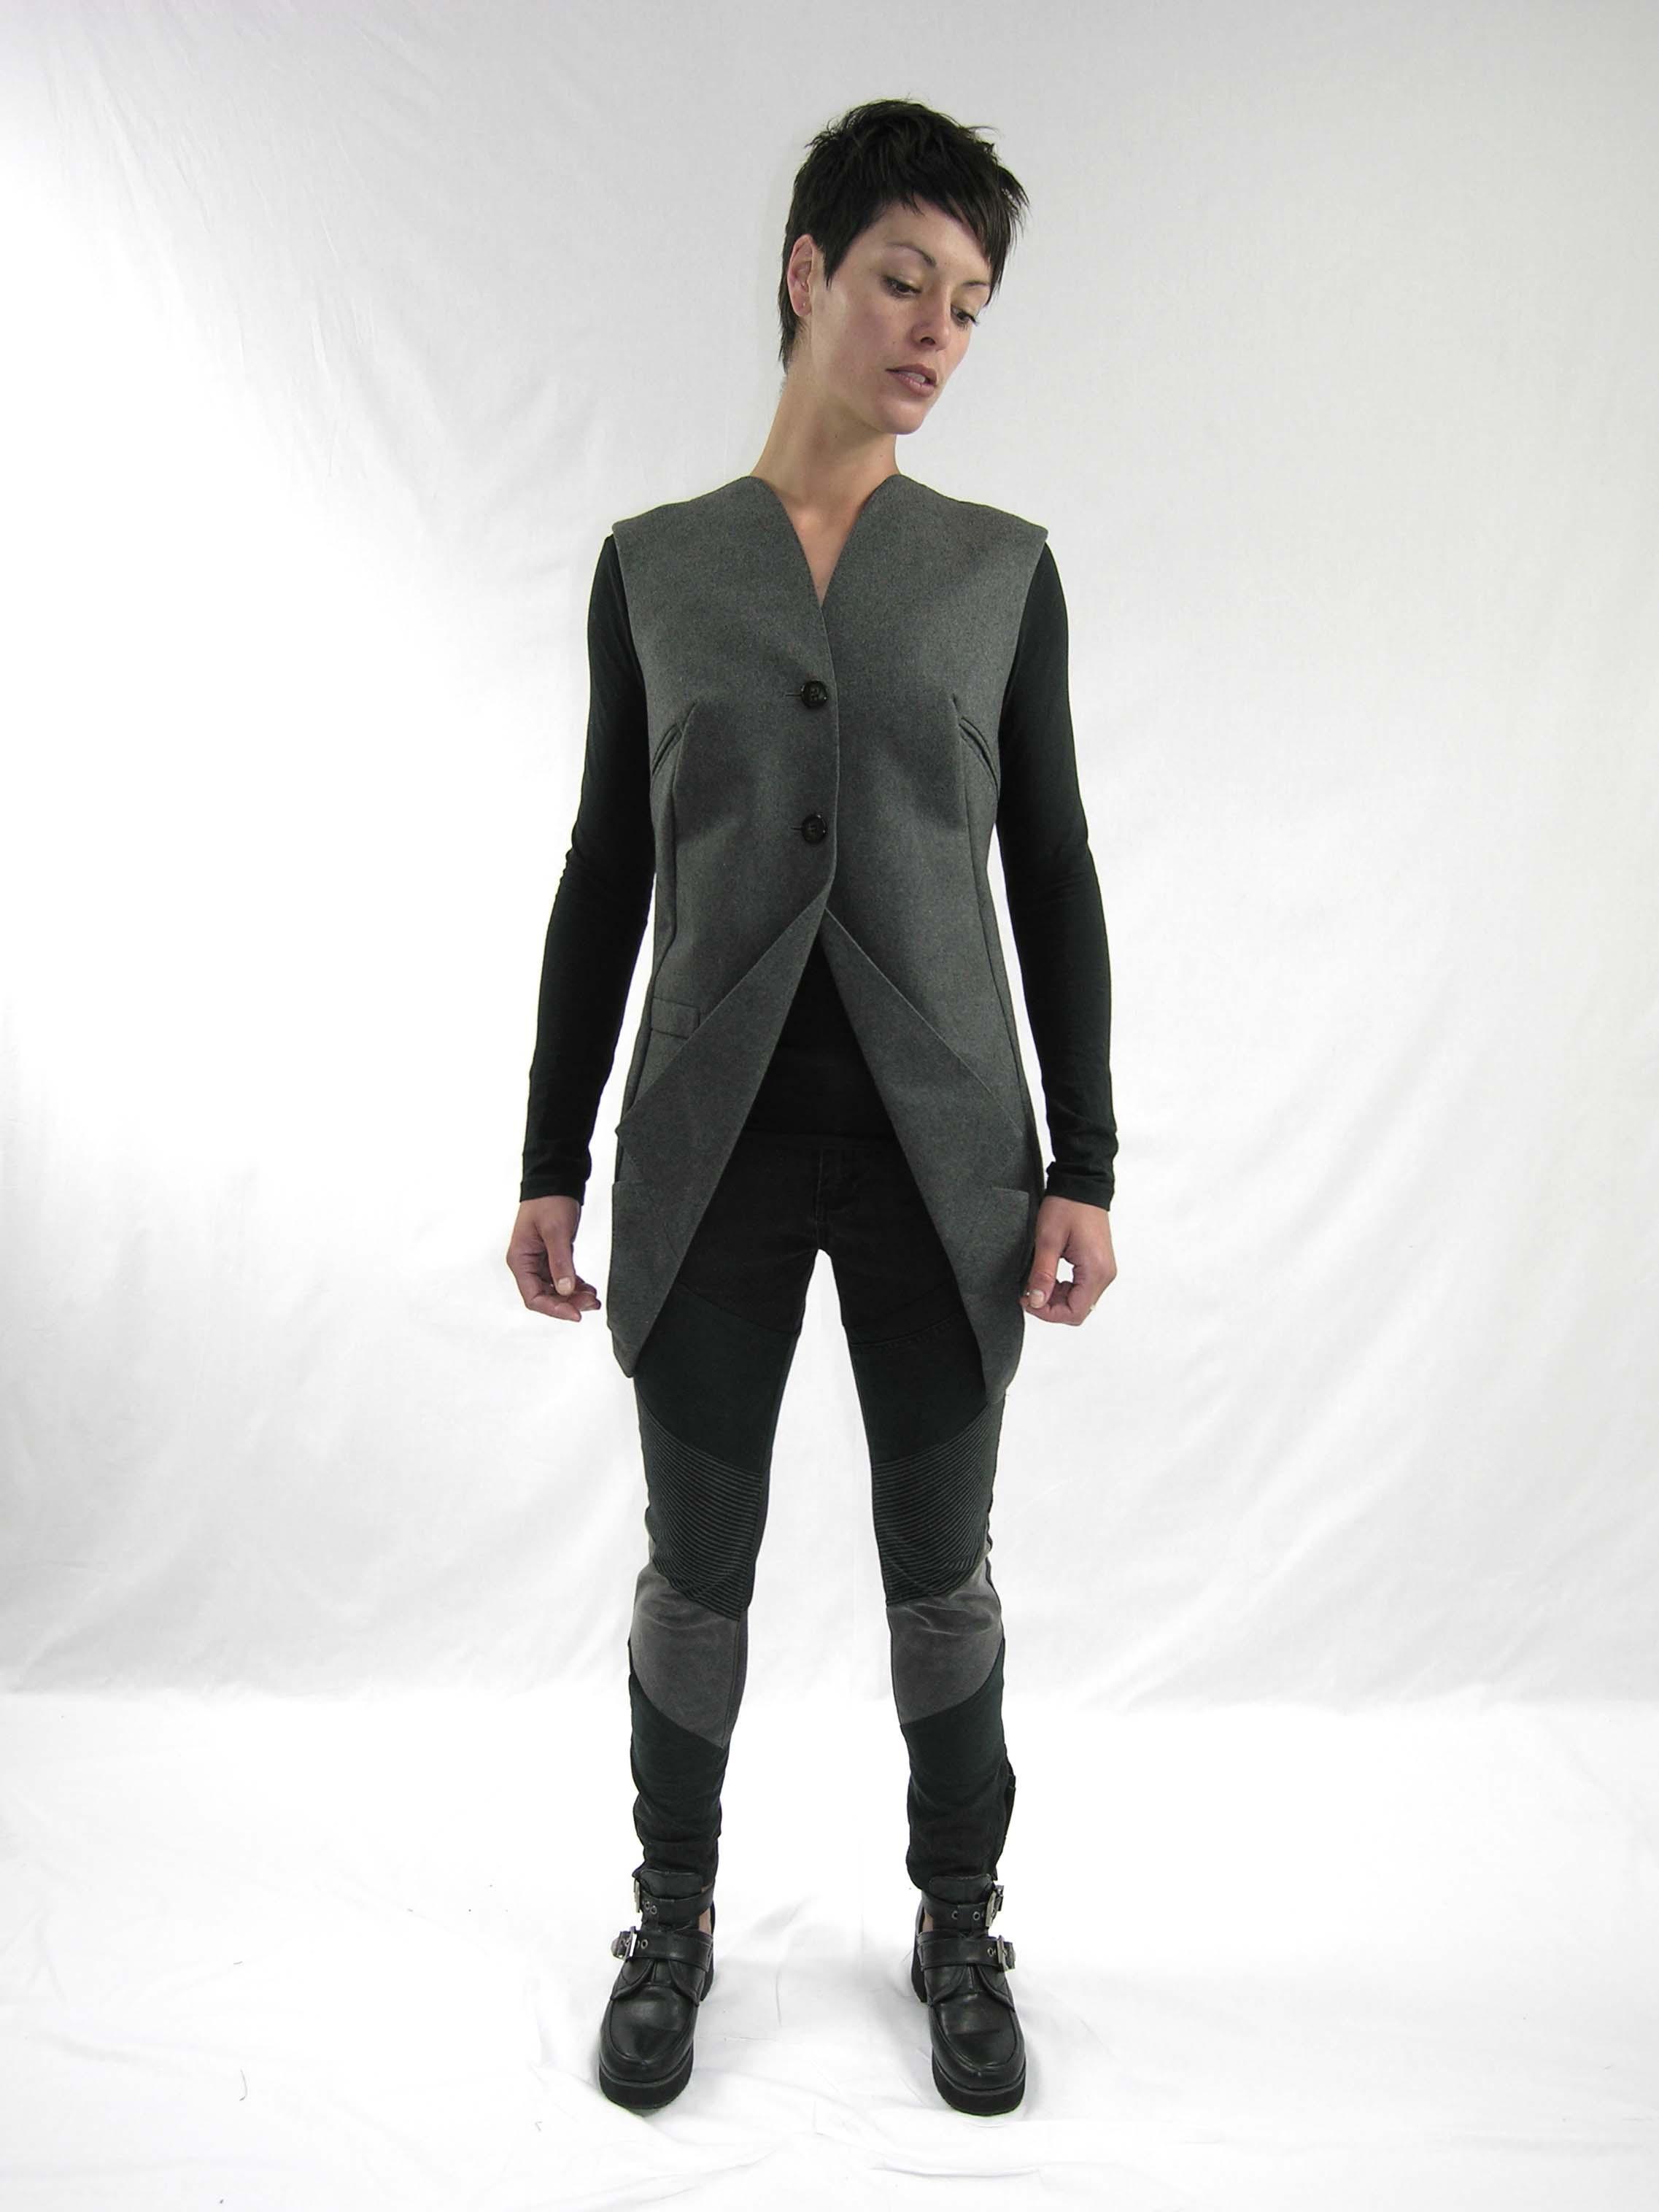 16drop vest, reconstructed jean